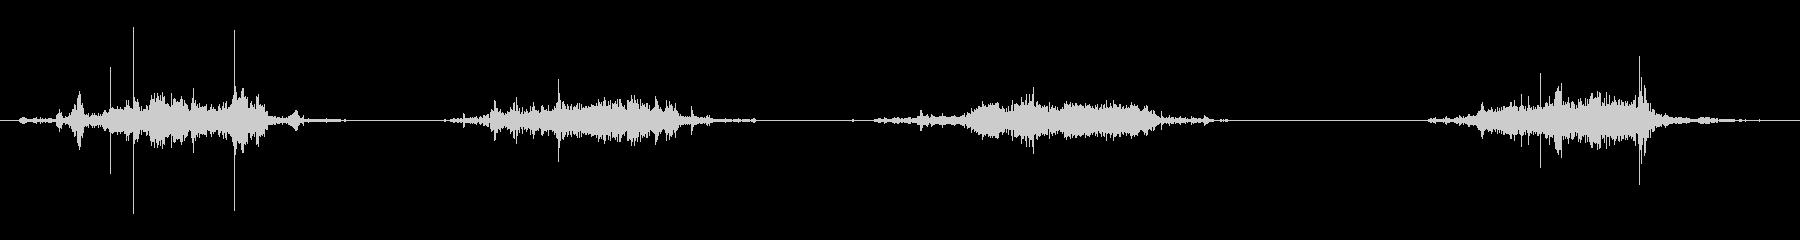 ASMR 重いものを引きずる音の未再生の波形